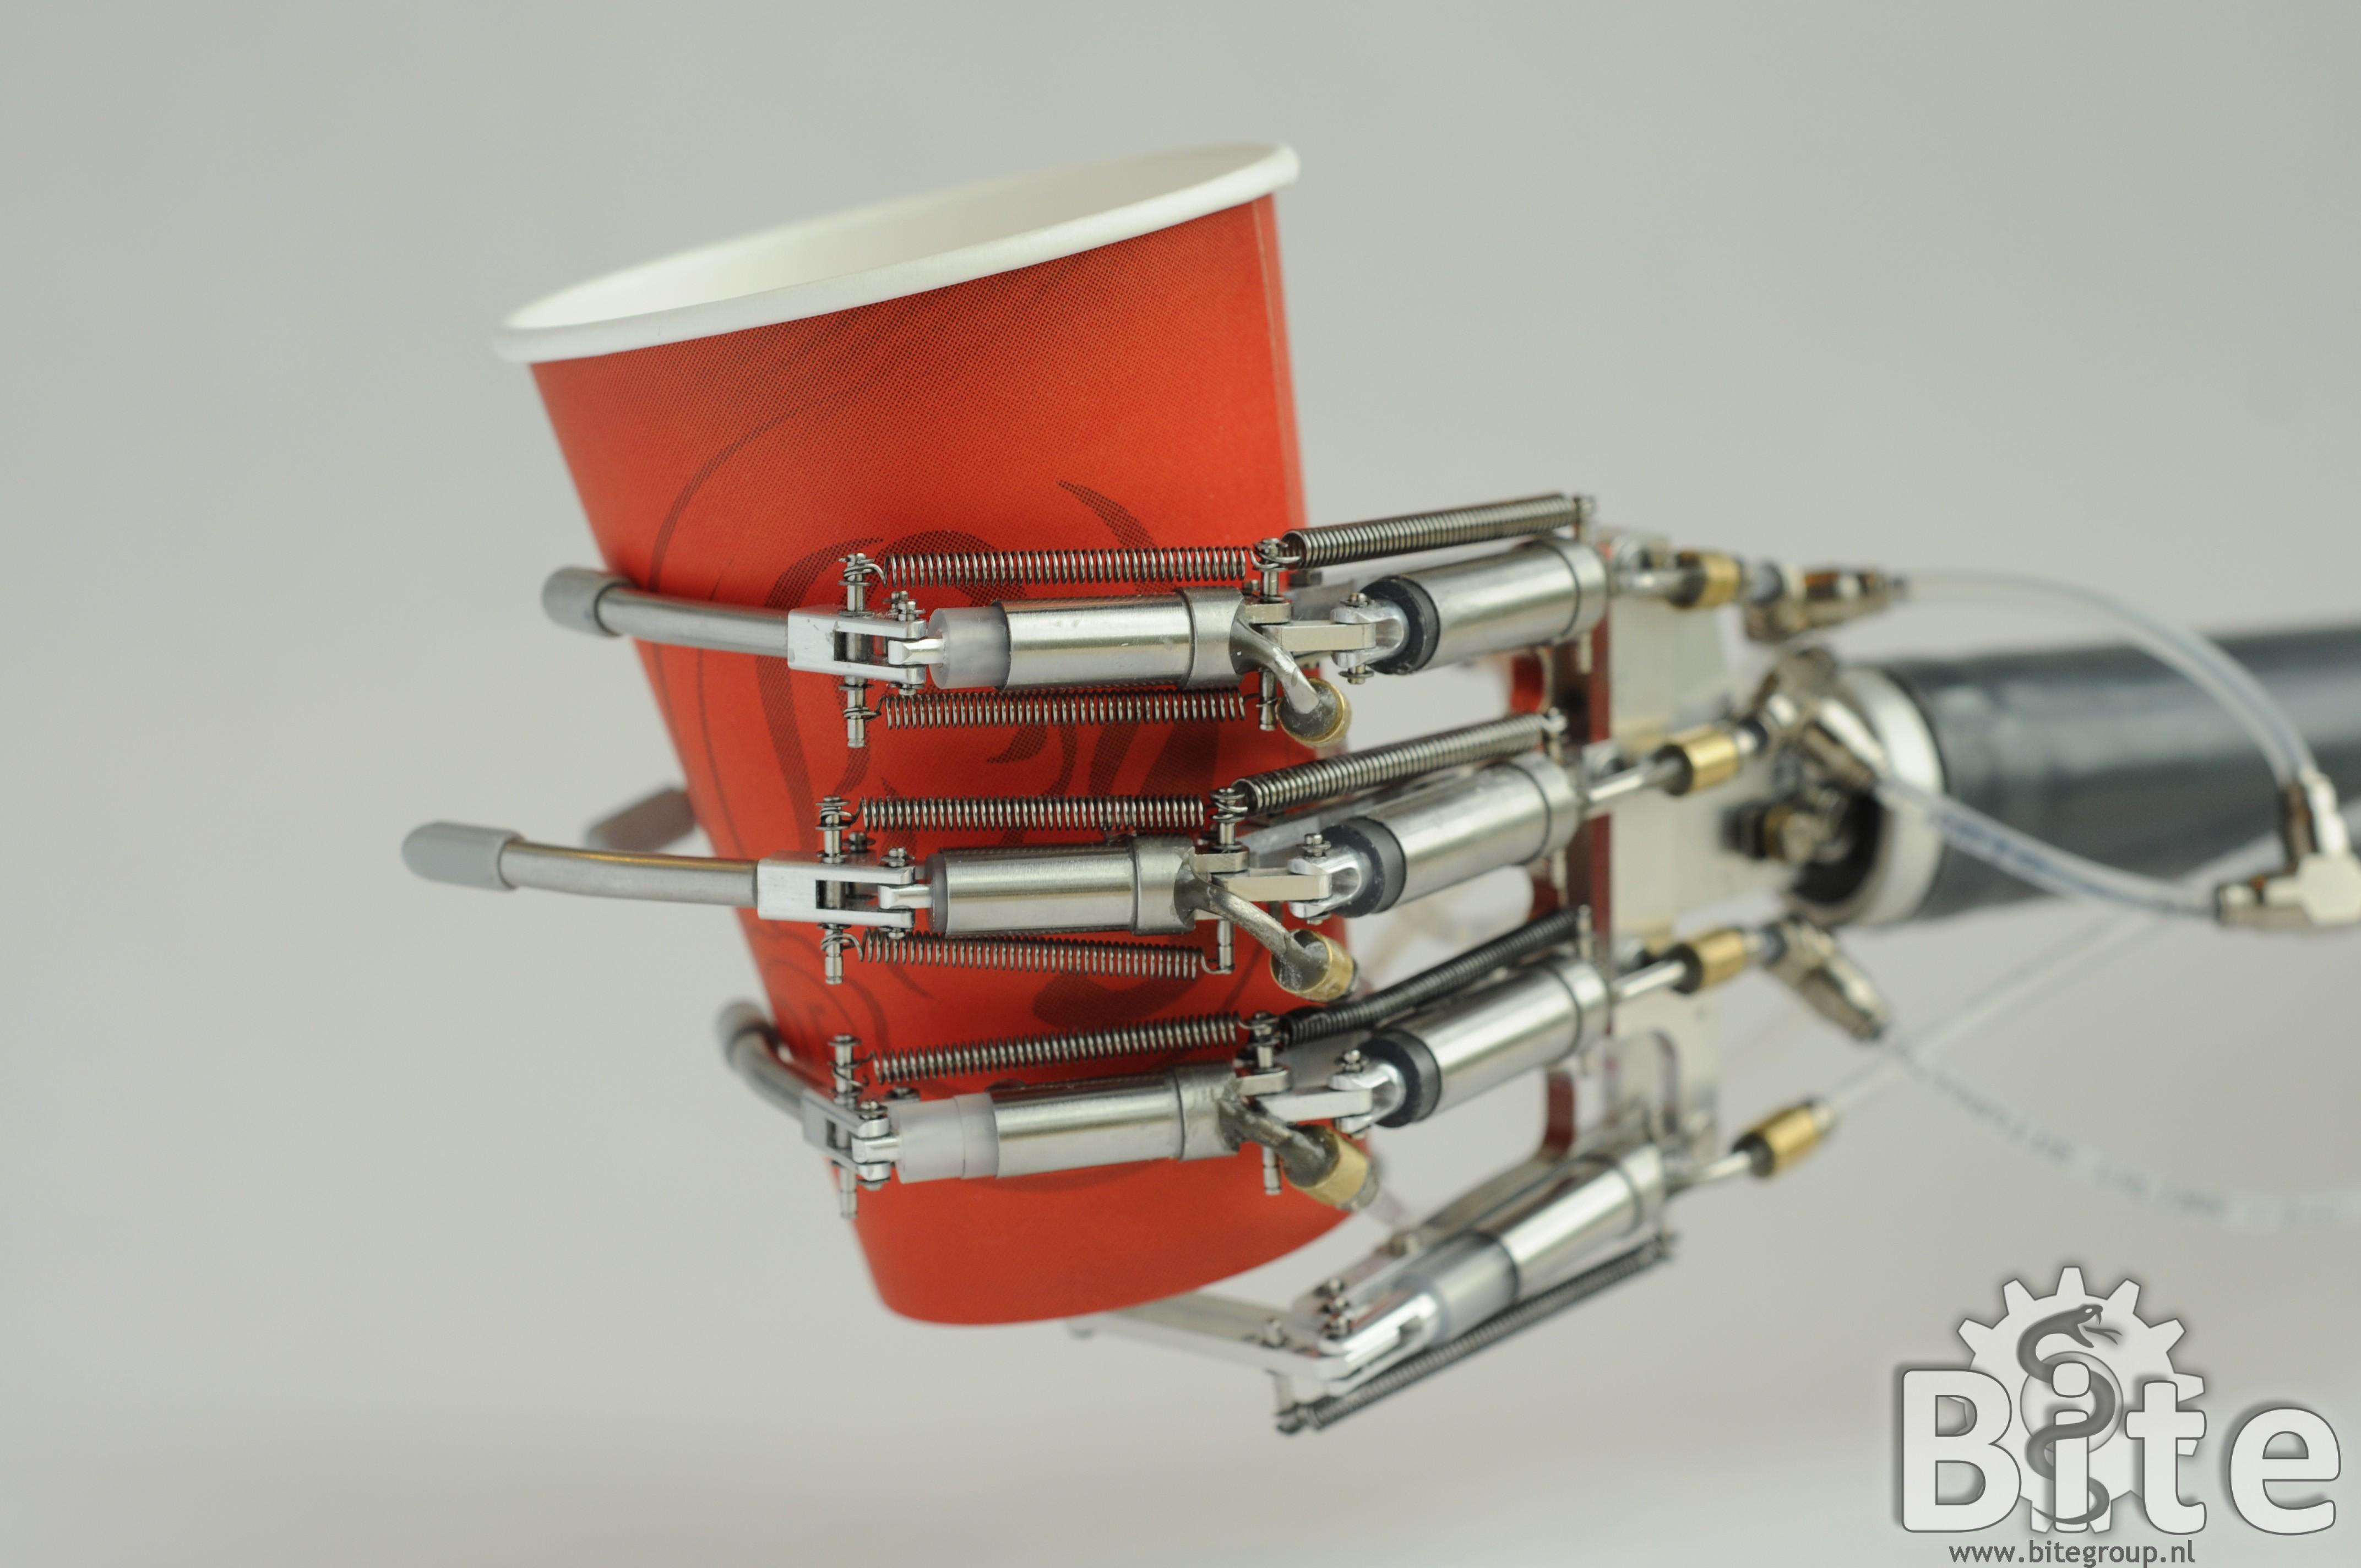 Delft Cylinder Hand